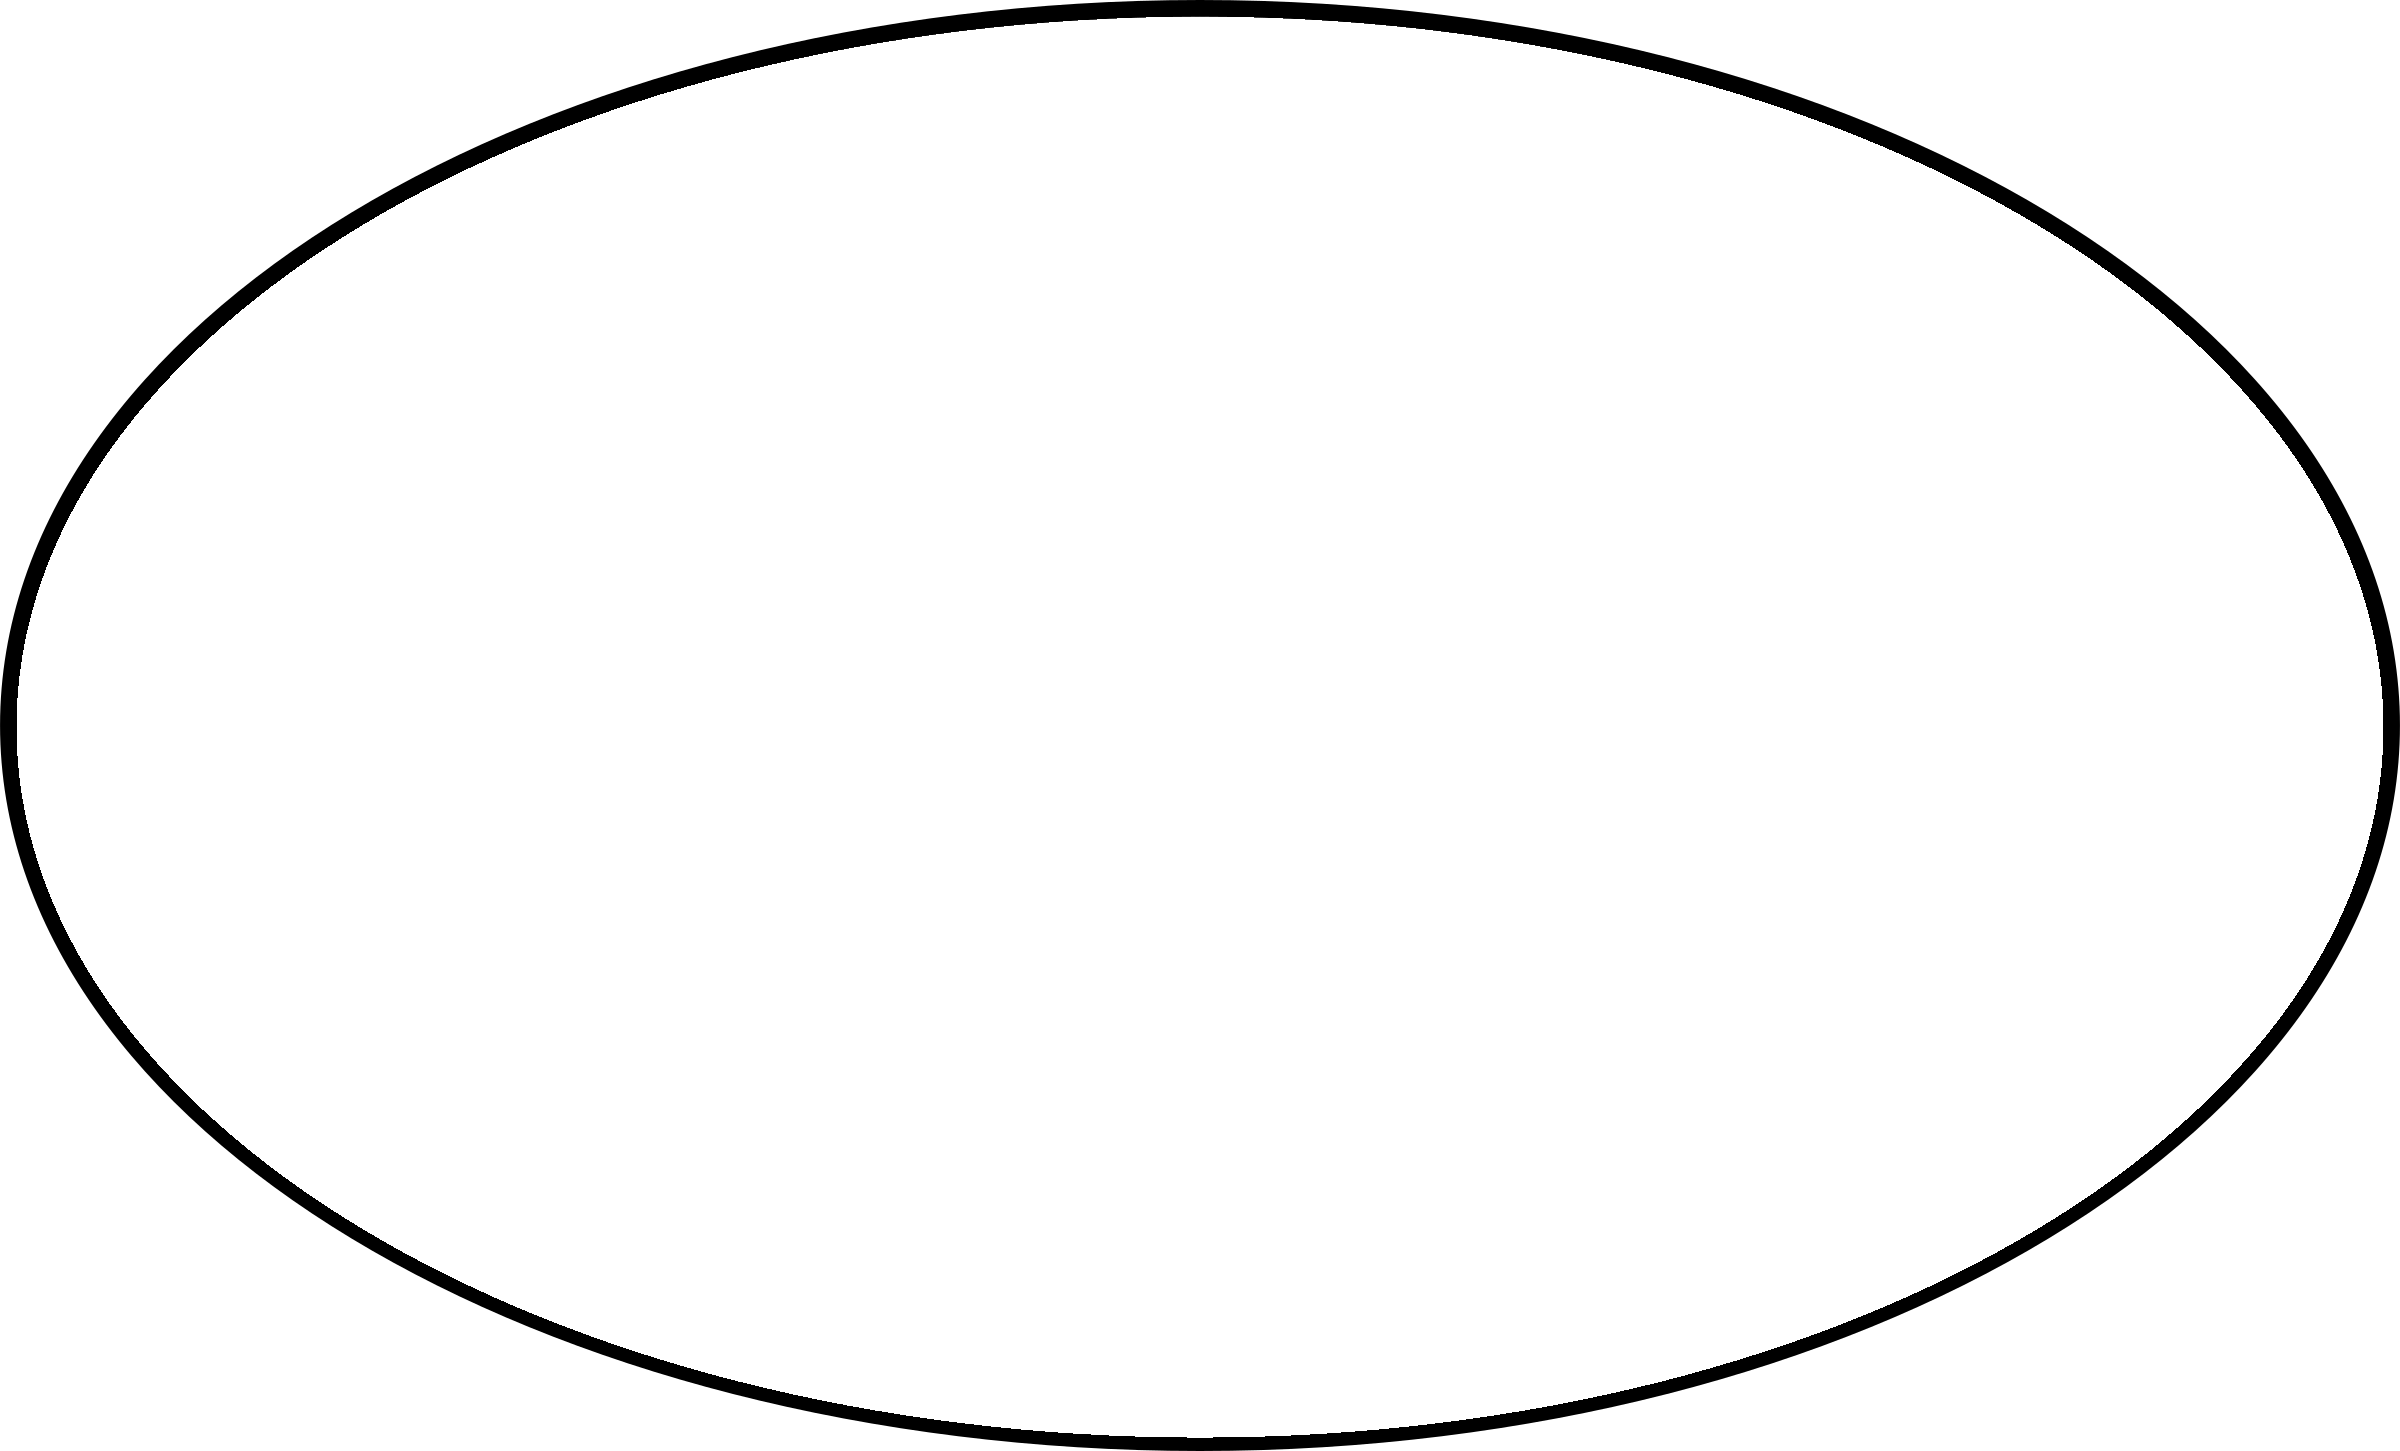 Tamoil Logo Png Transparent Svg Vector Freebie Supply